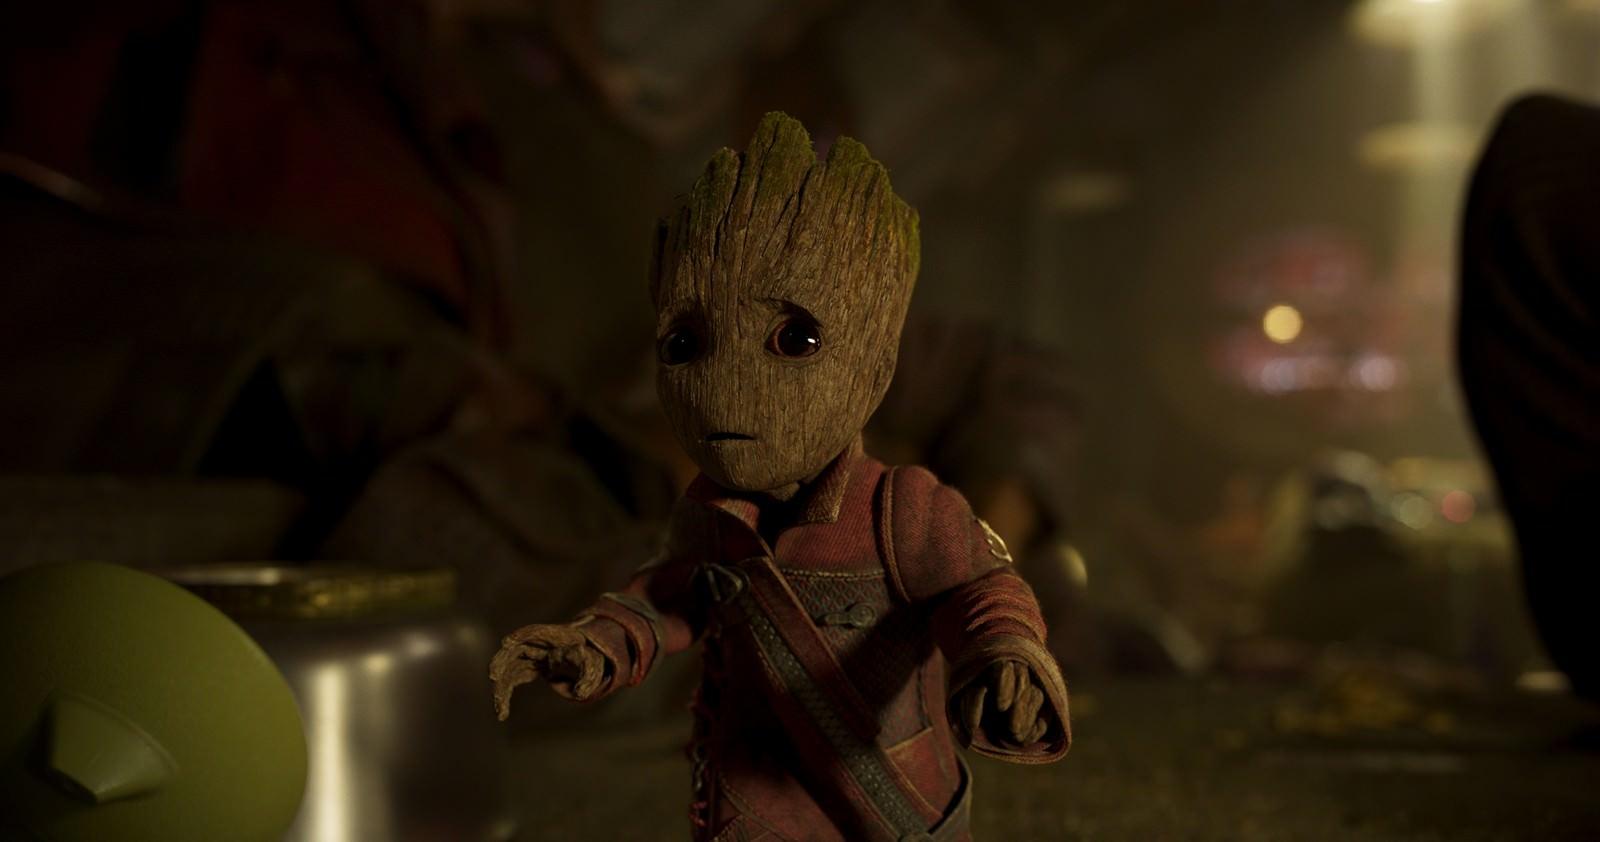 Movie, Guardians of the Galaxy Vol. 2(美國, 2017年) / 星際異攻隊2(台灣) / 银河护卫队2(中國) / 銀河守護隊2(香港), 電影角色與演員介紹